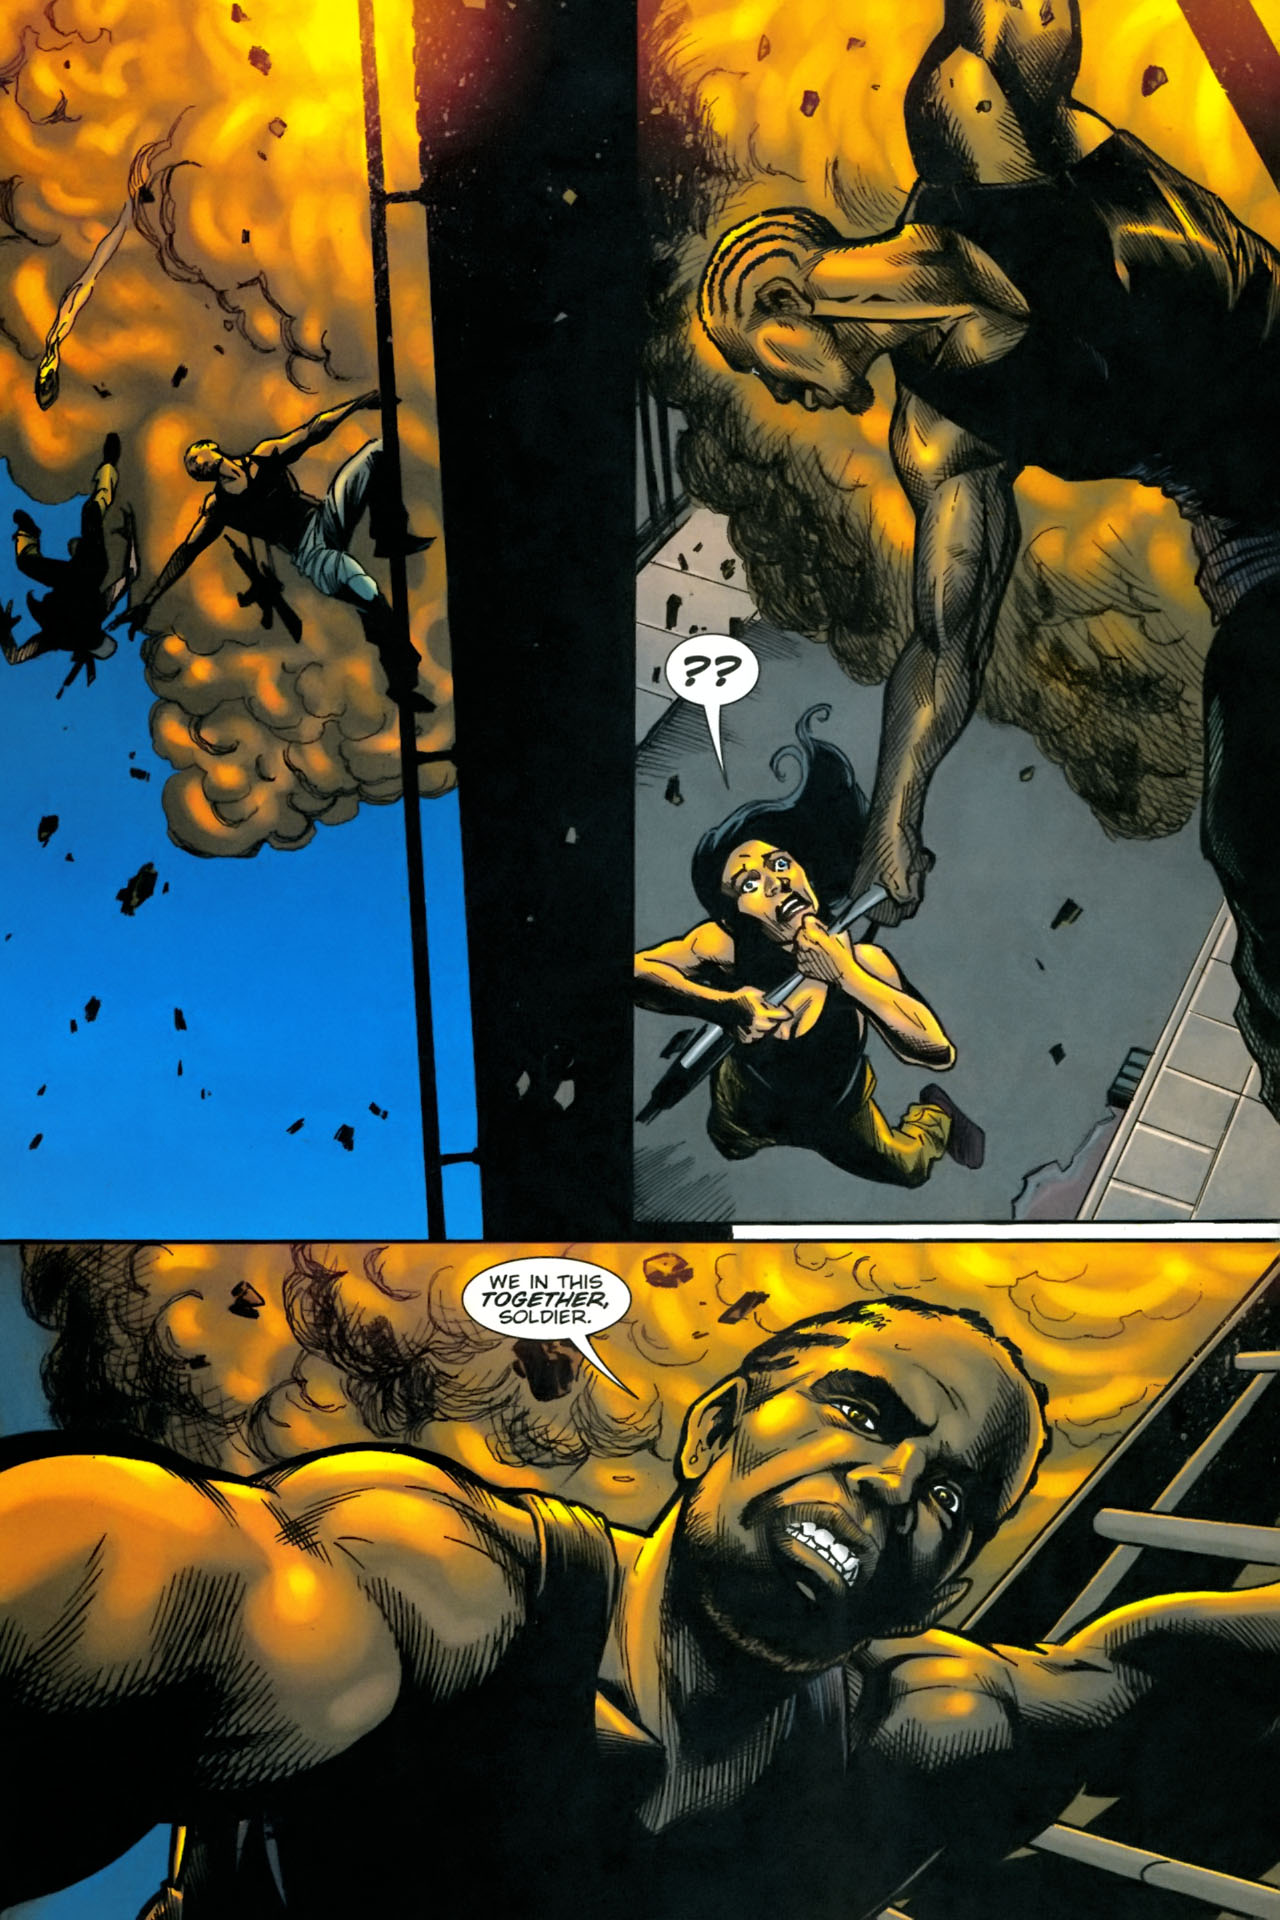 Read online The Exterminators comic -  Issue #23 - 10